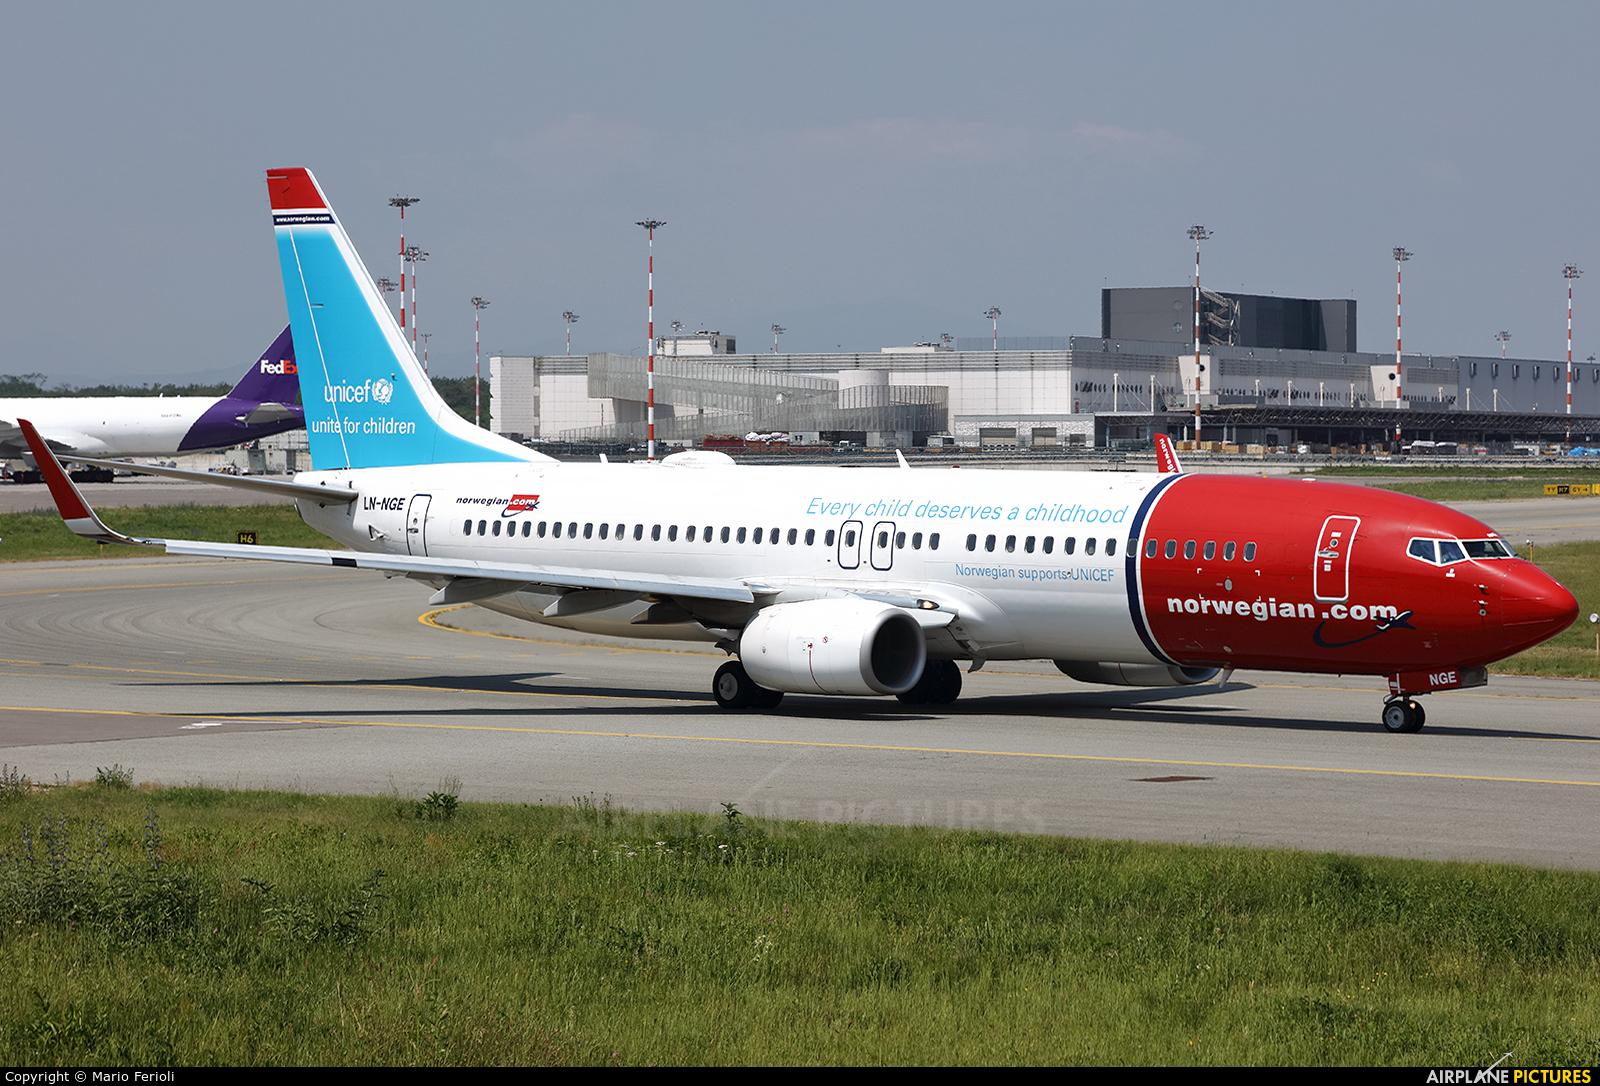 Norwegian Air Shuttle LN-NGE aircraft at Milan - Malpensa